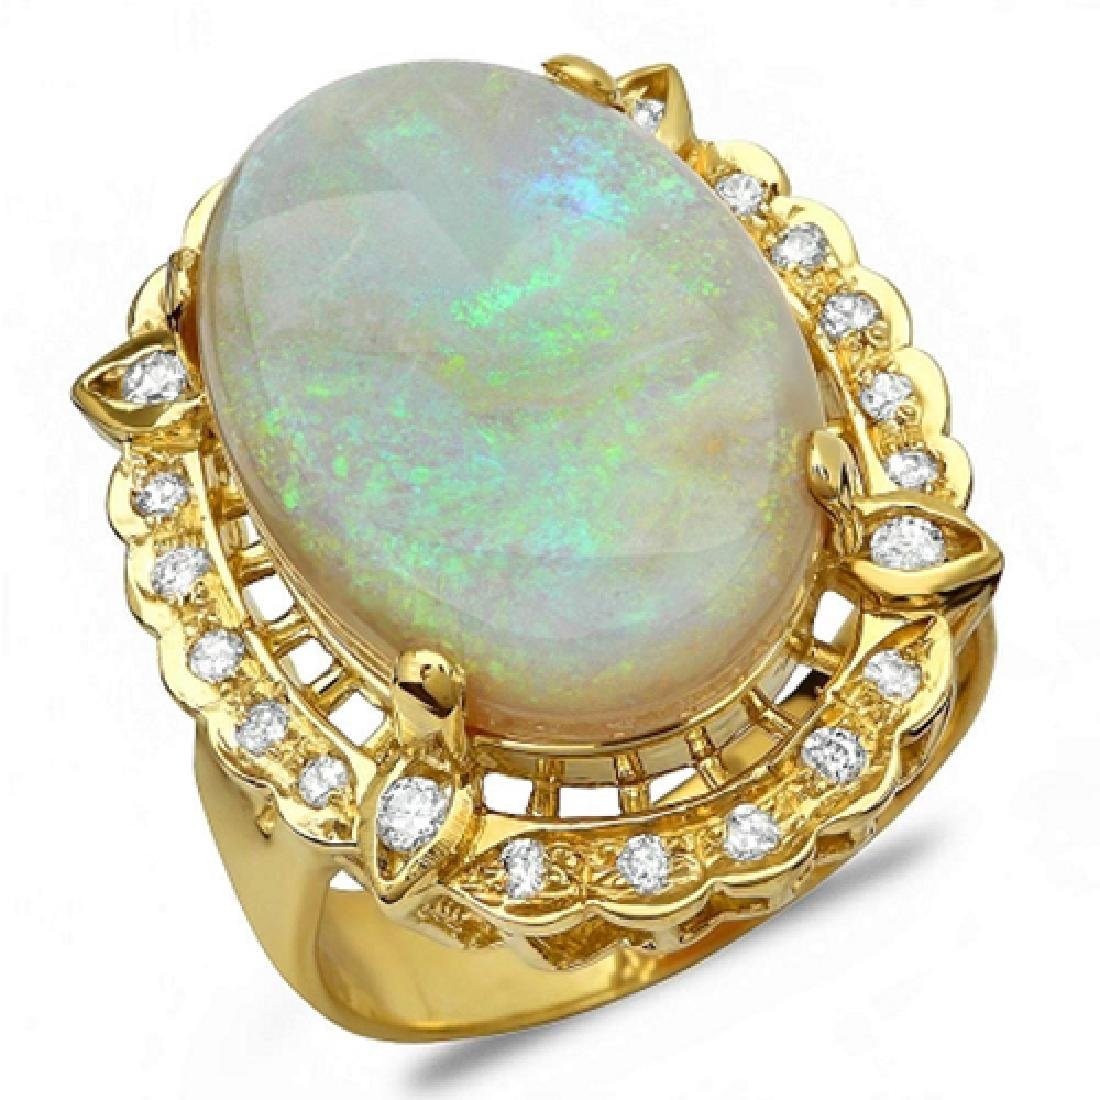 12.38 Carat Natural Opal 18K Solid Yellow Gold Diamond